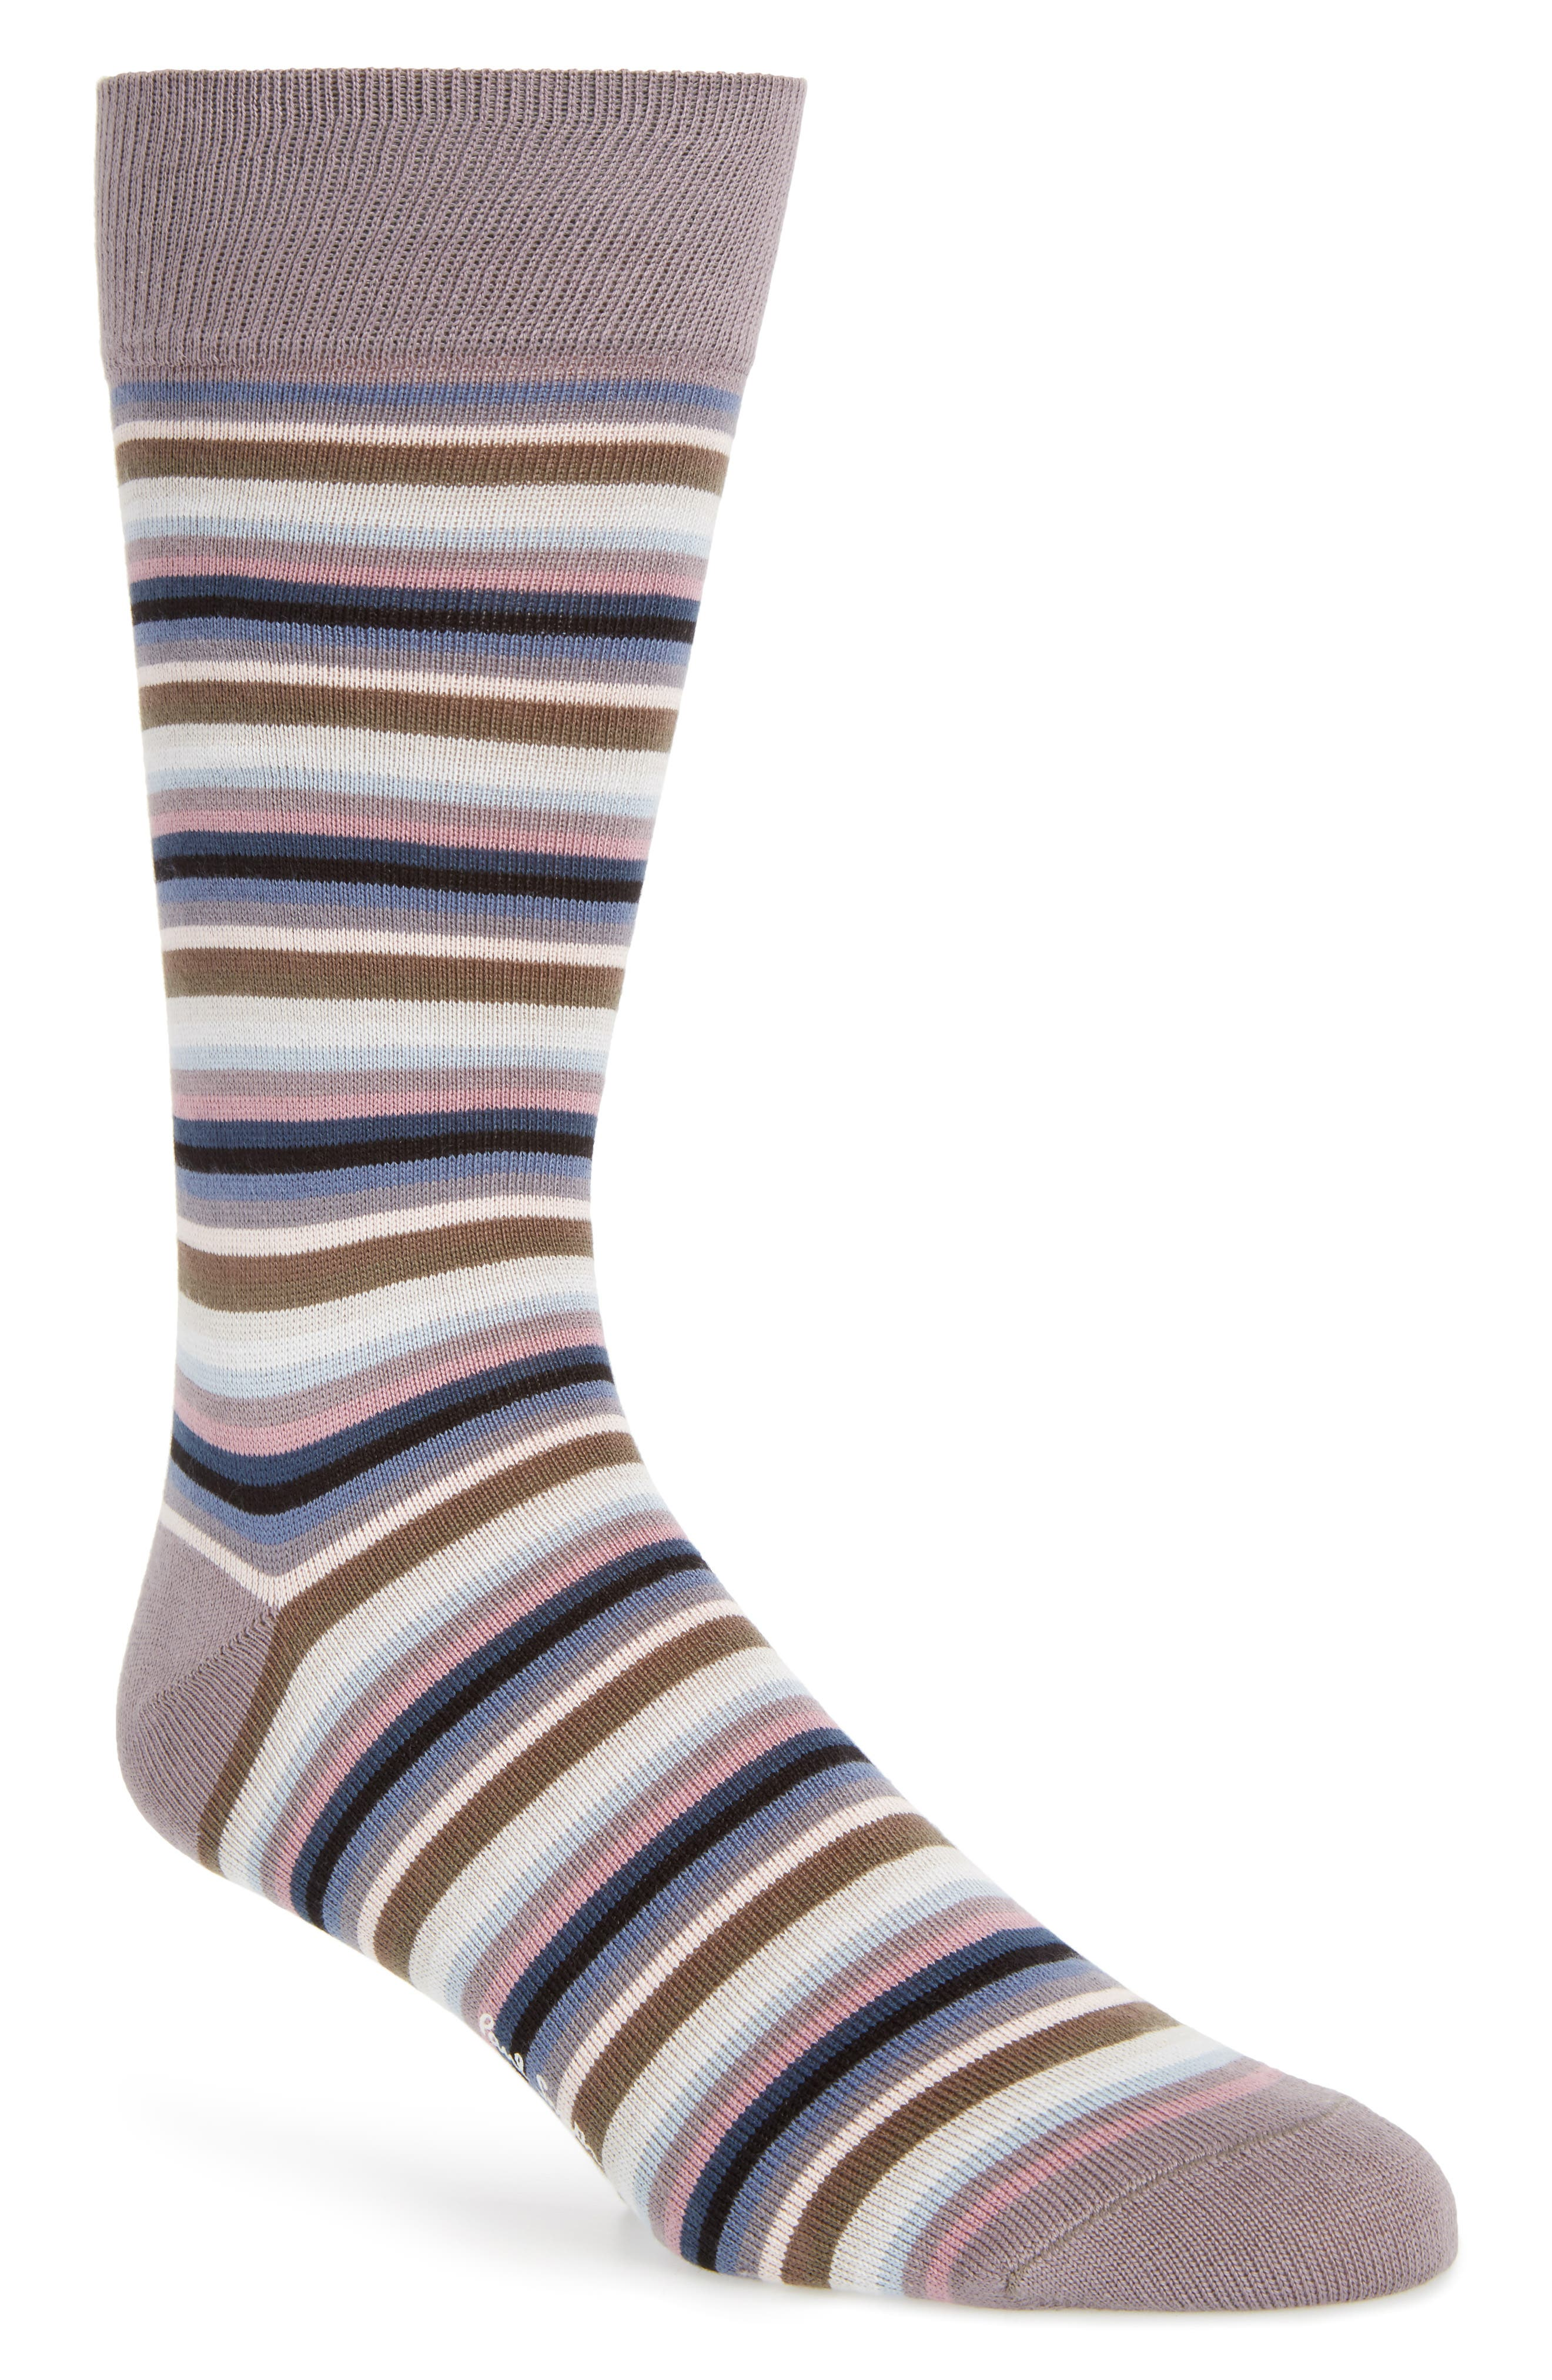 Paul Smith Degradé Stripe Socks